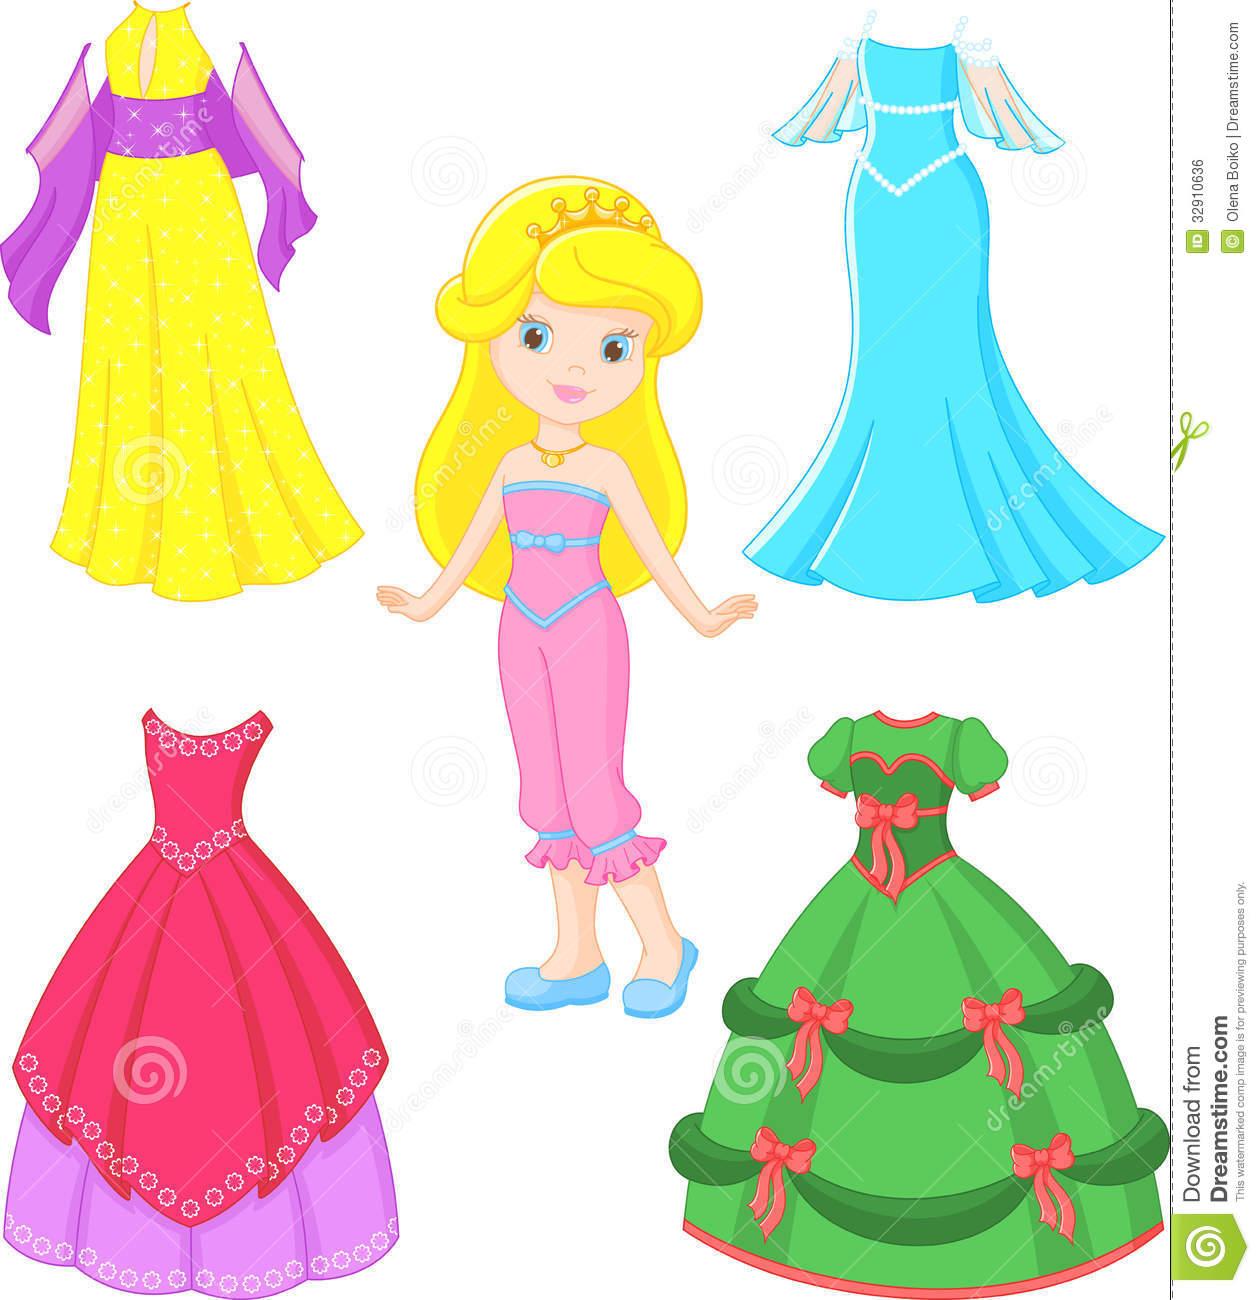 Princess dress clipart 1 » Clipart Station.